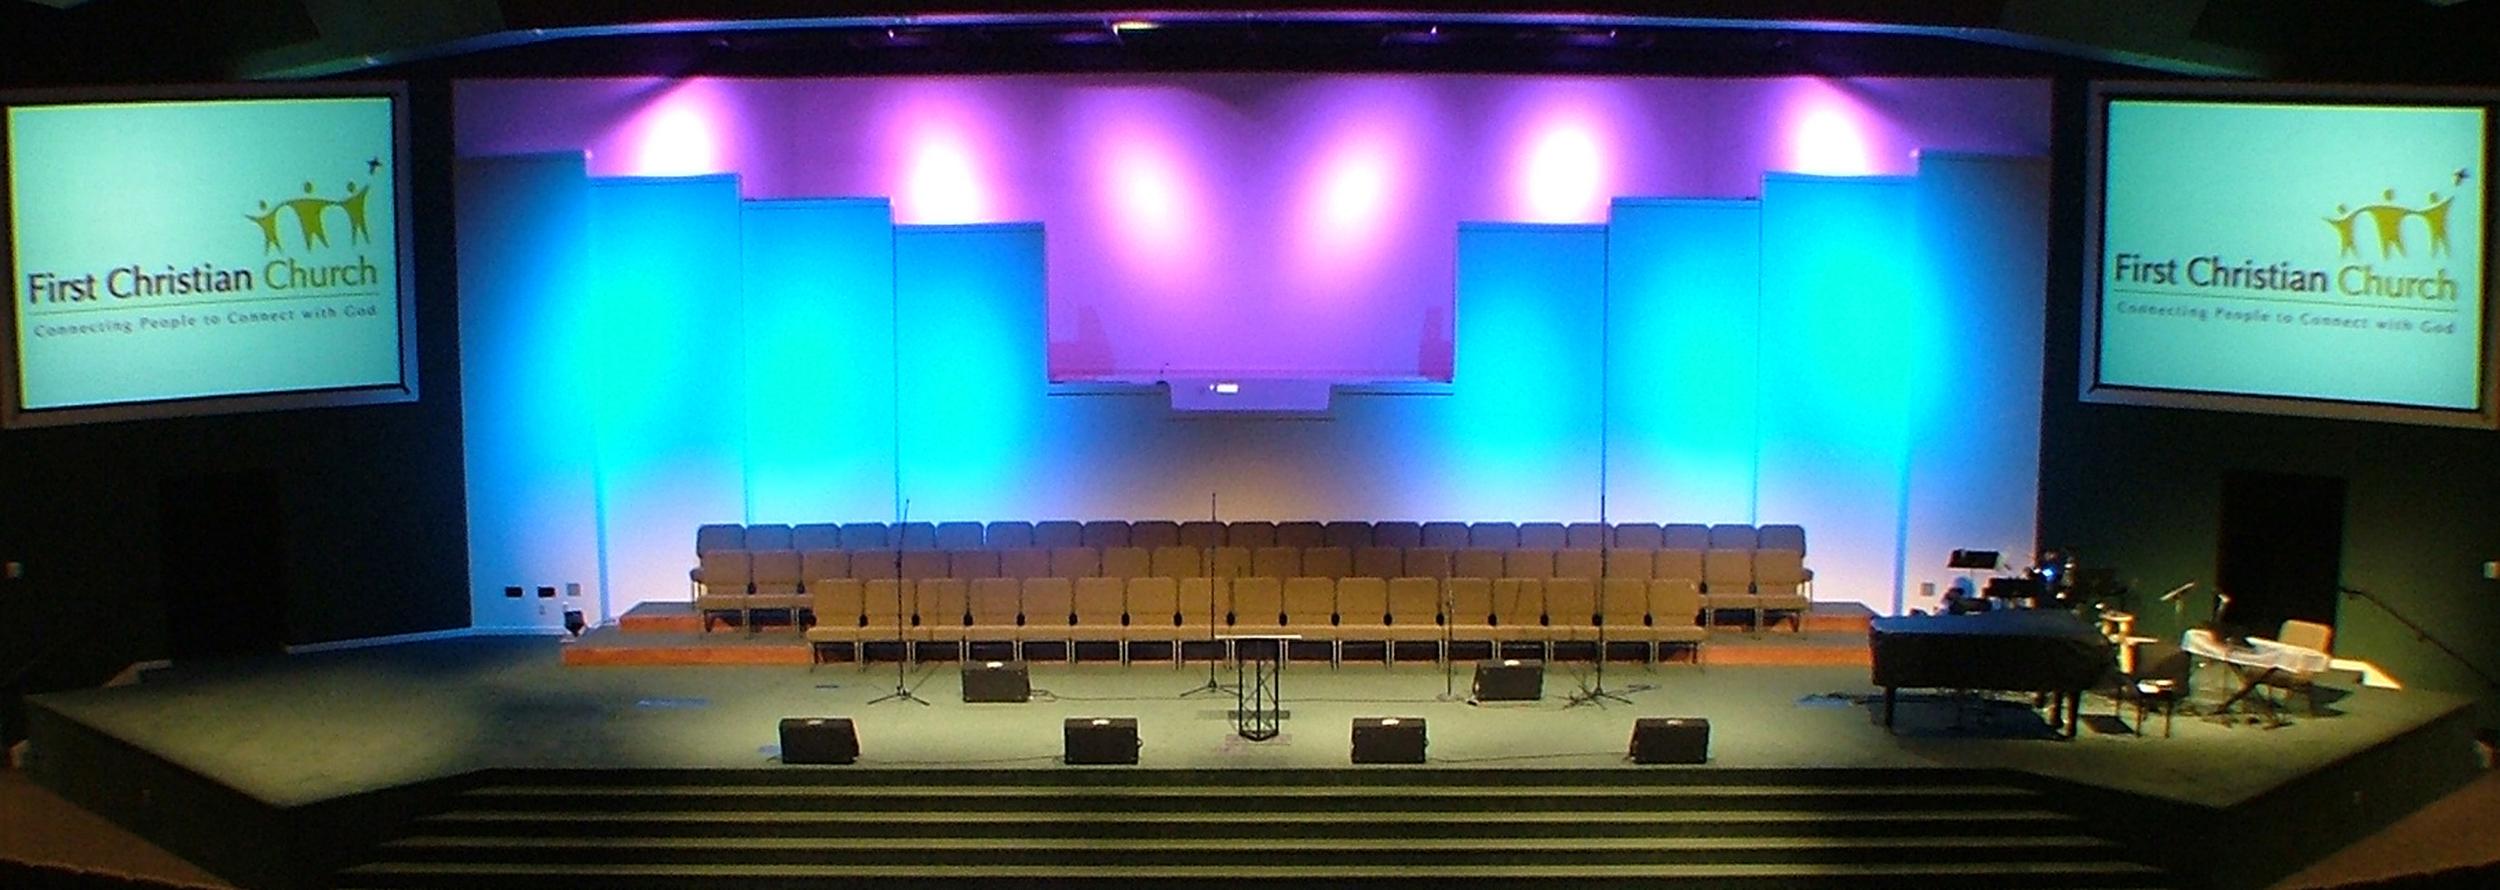 www.rcmarchitects.com - first christian church (3)